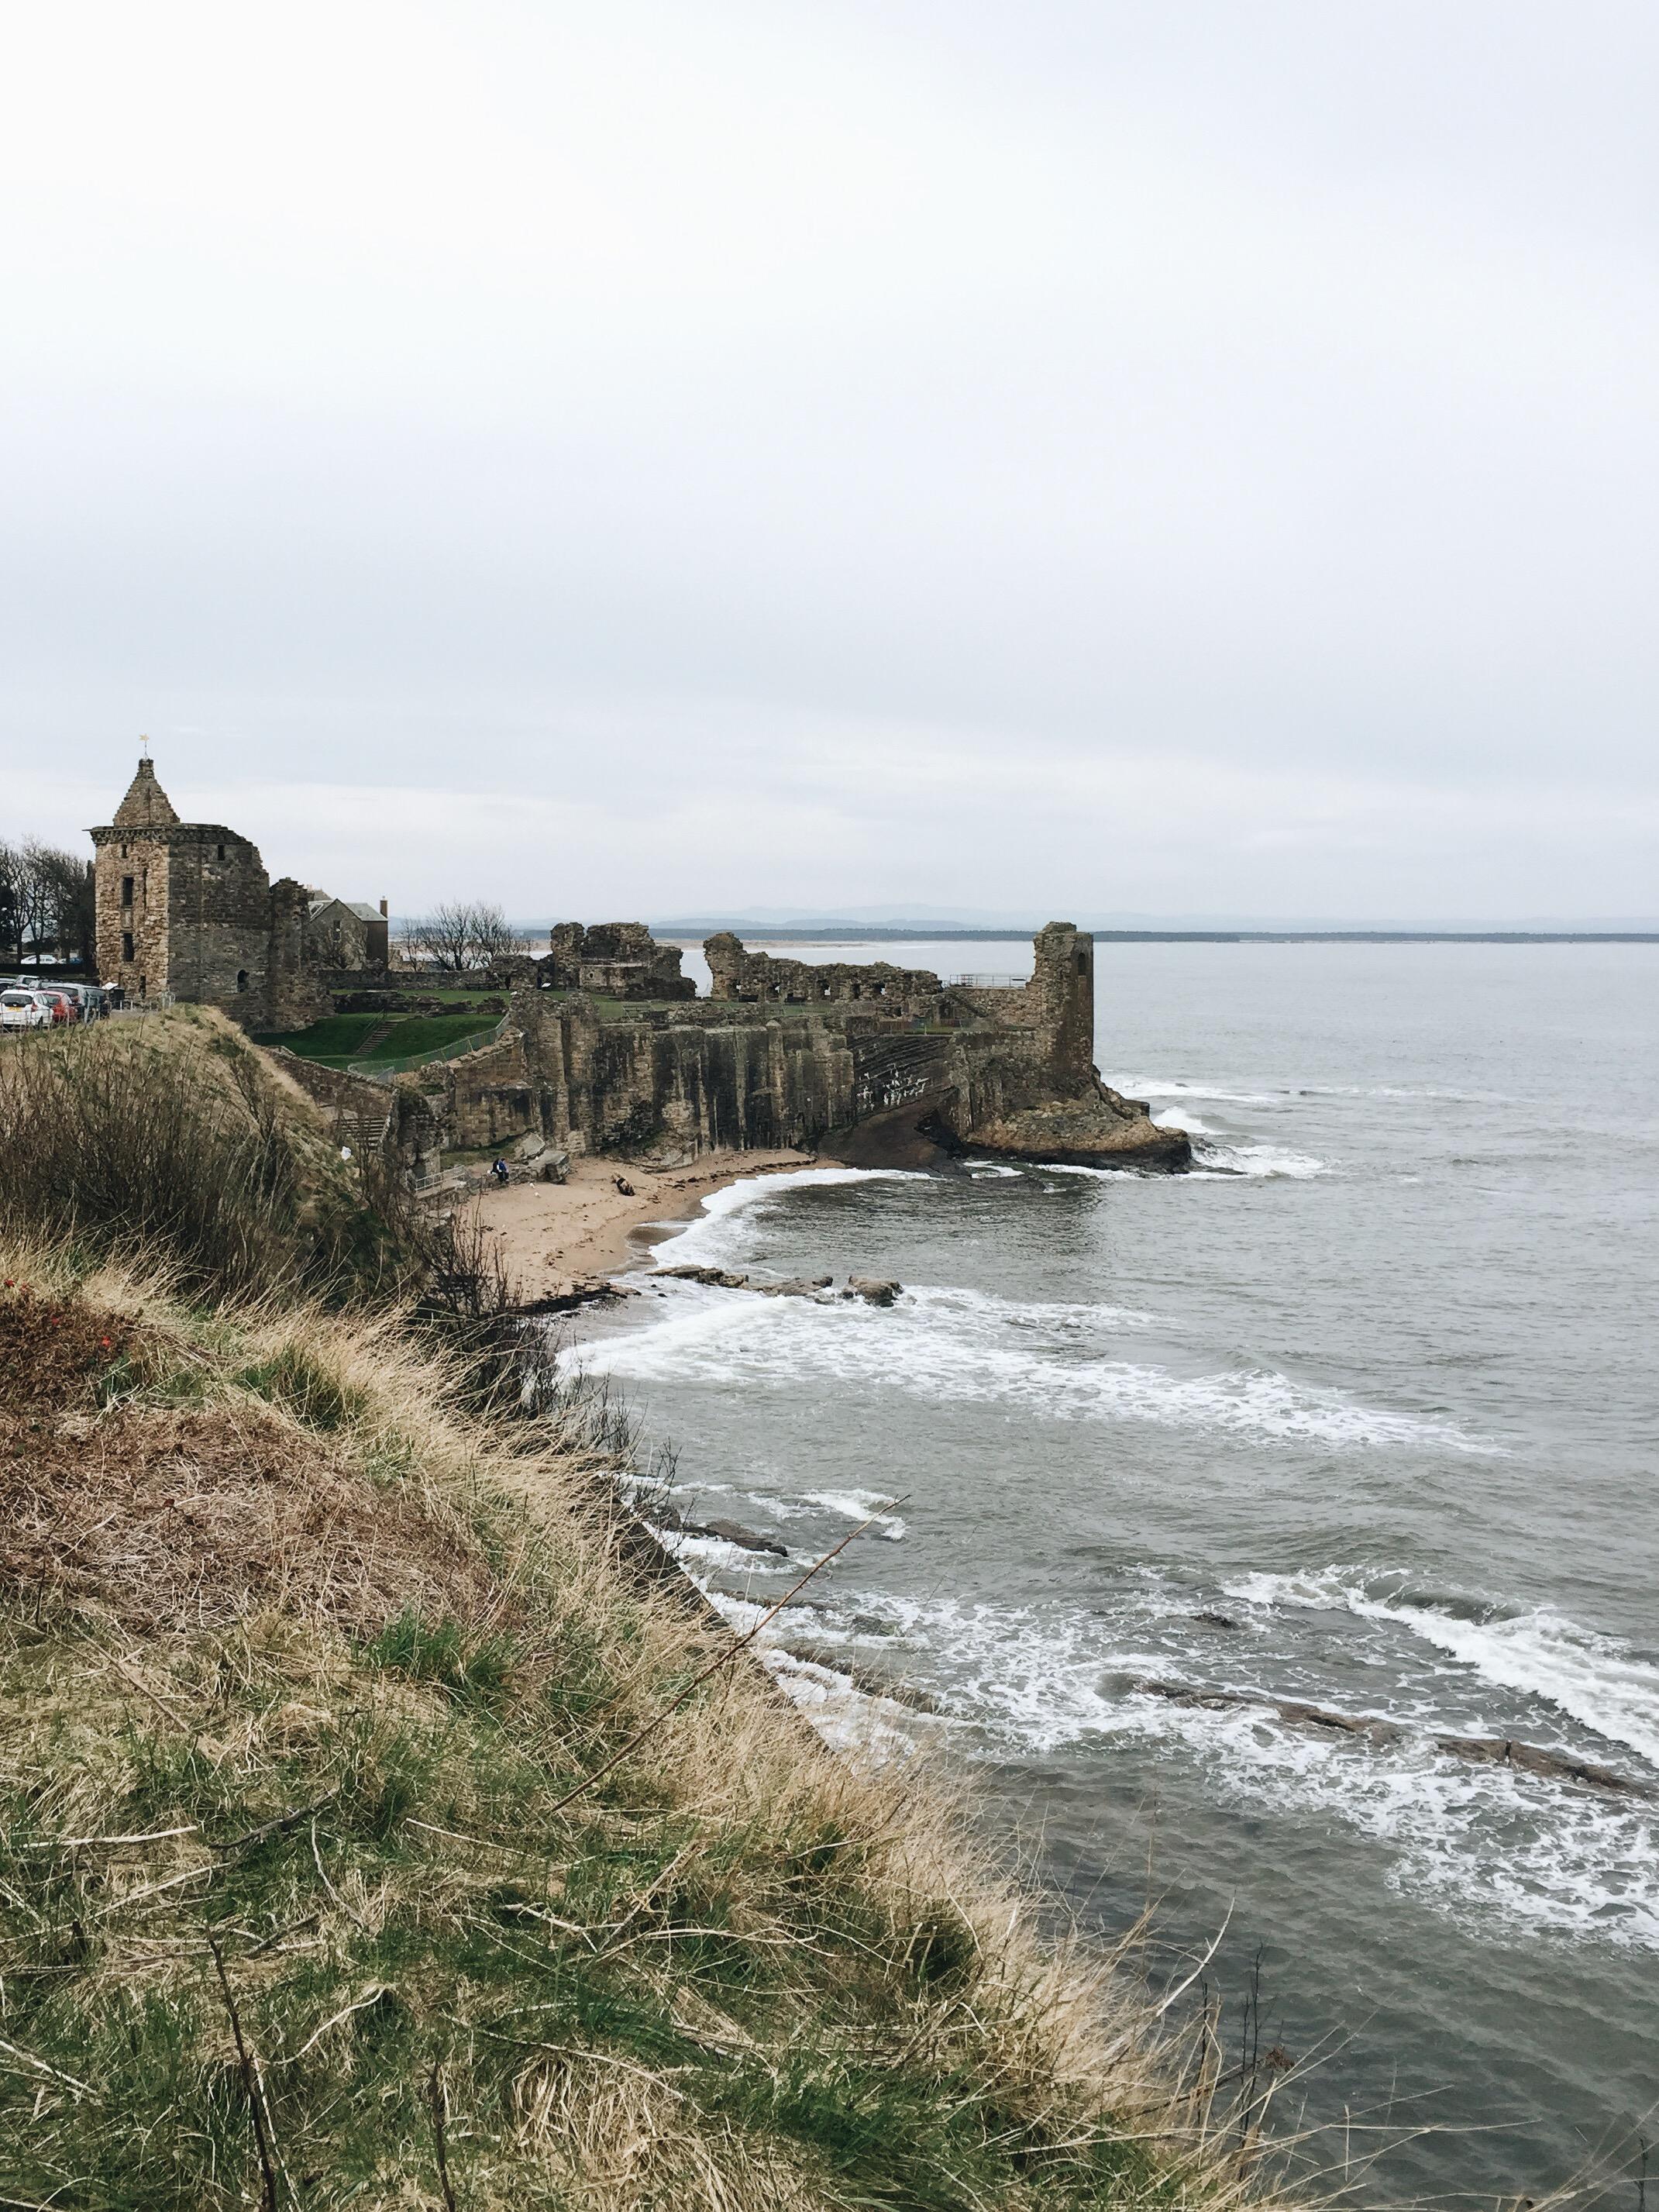 St. Andrew's Castle ruins